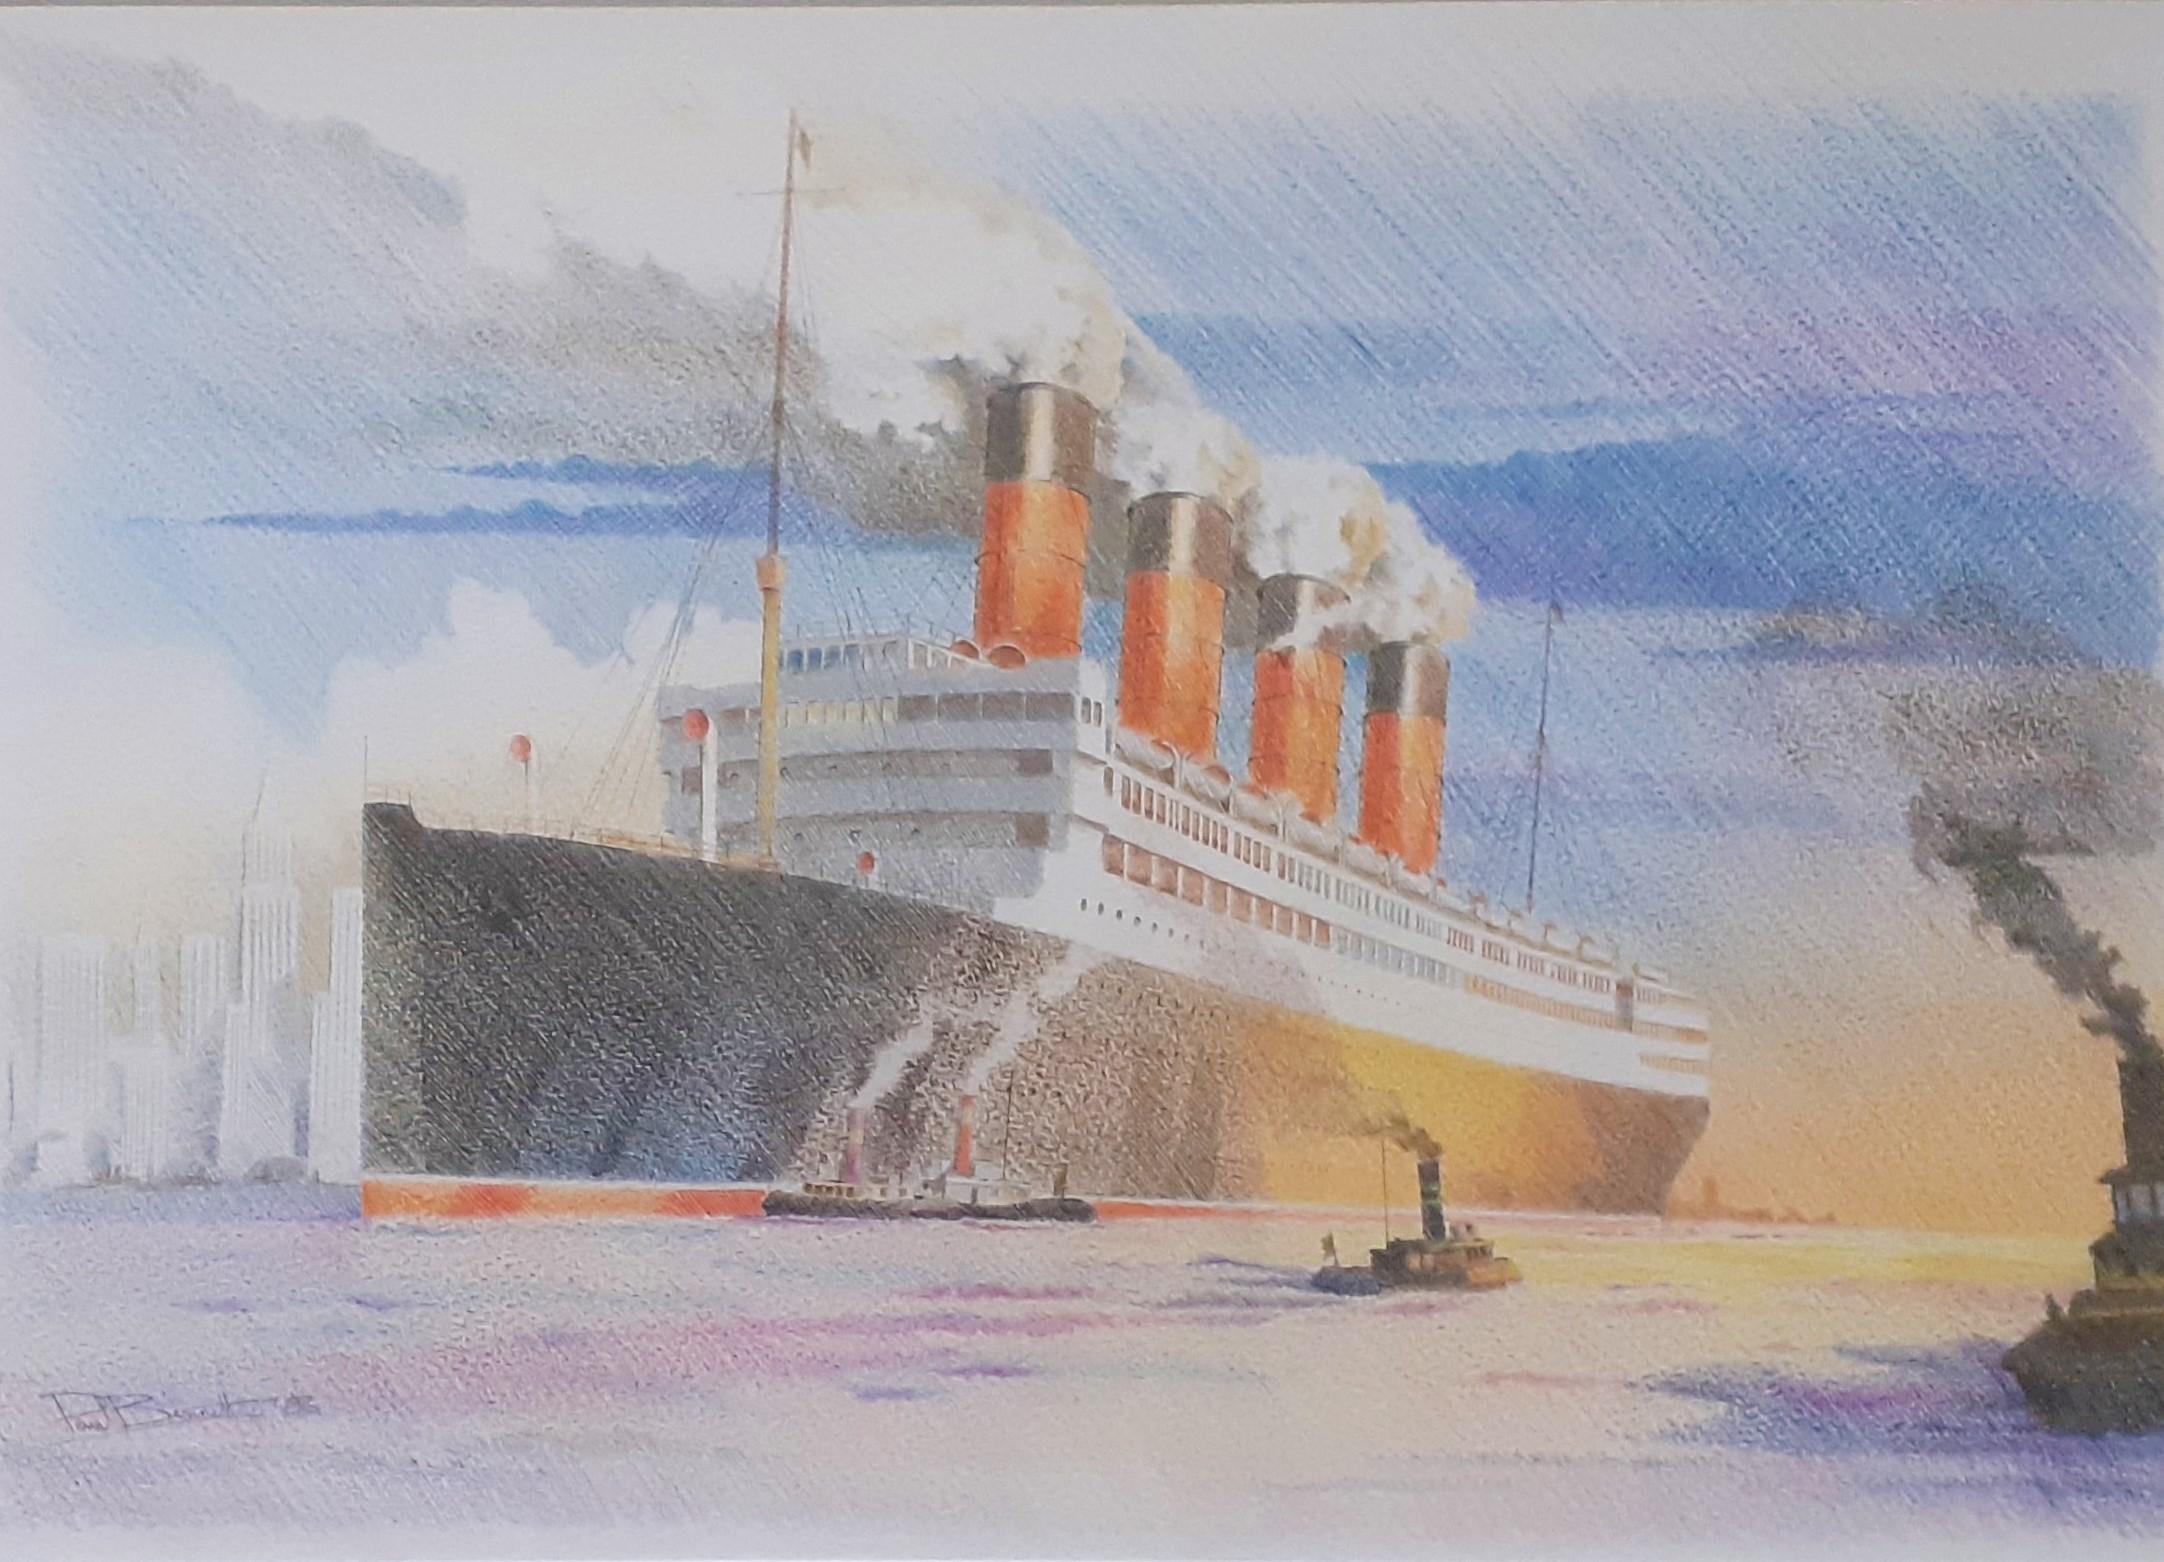 """New York Arrival (The Aquitania)"""